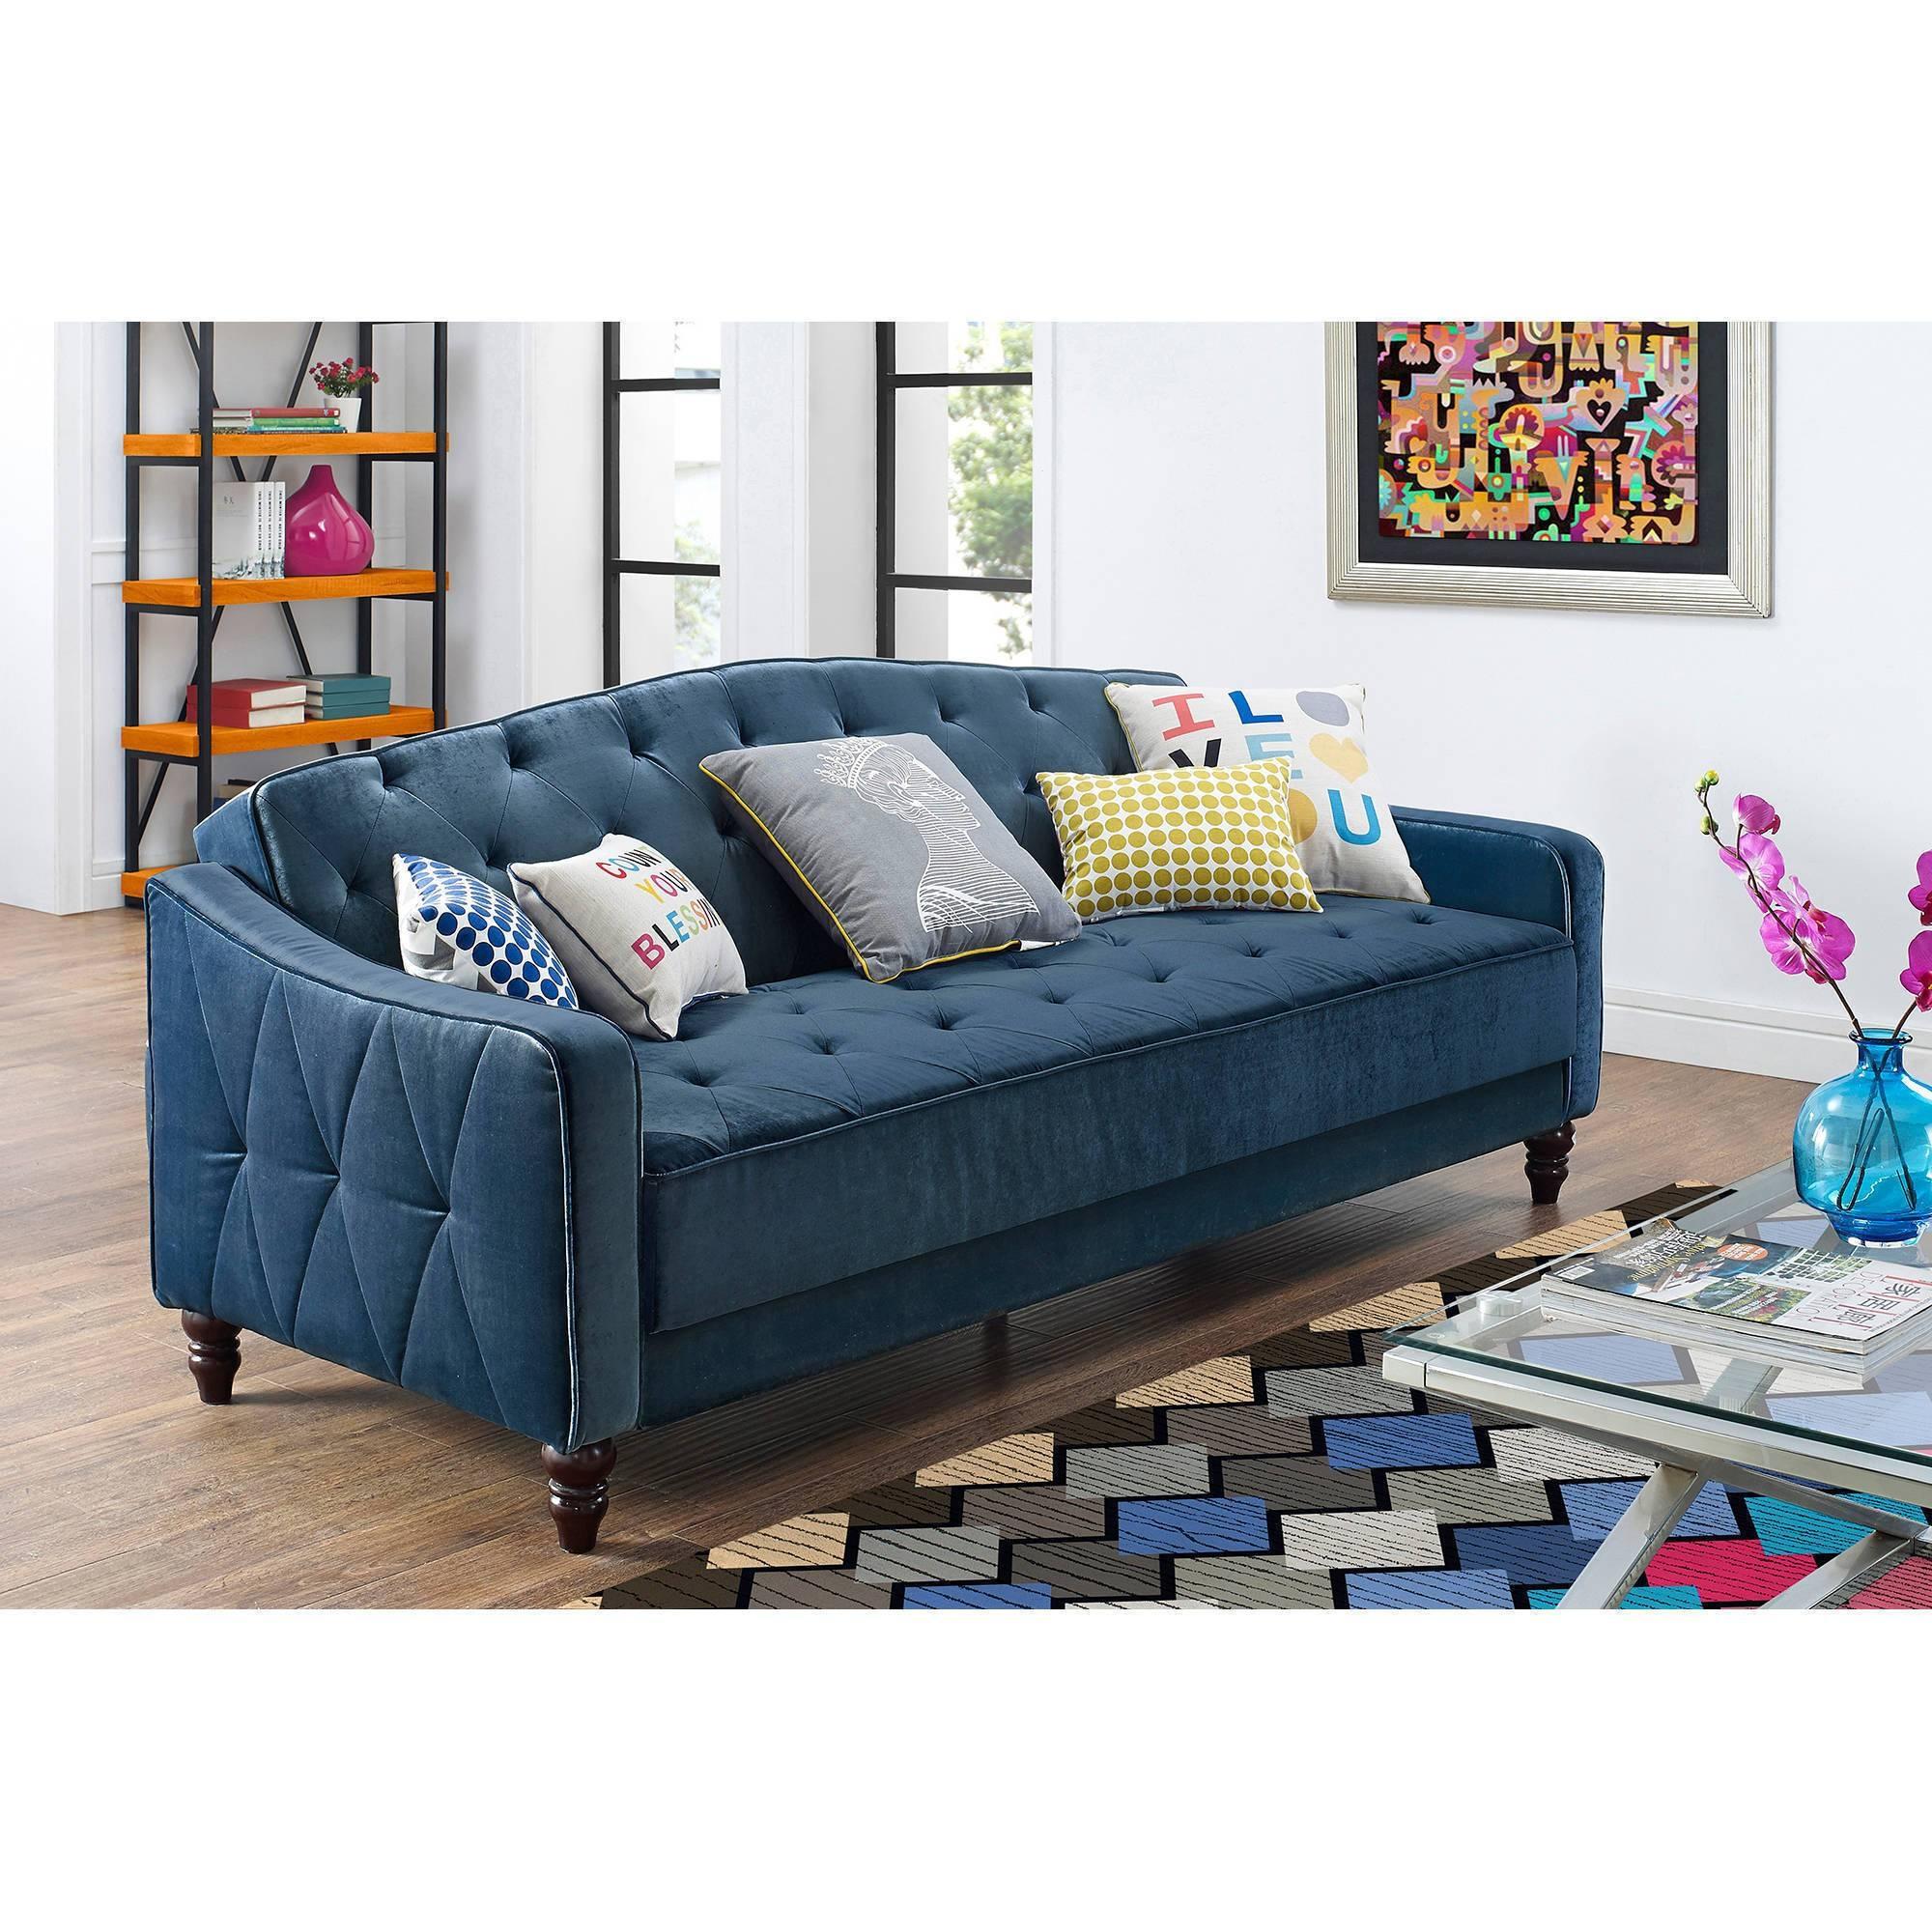 Mainstays Contempo Futon Sofa Bed | Roselawnlutheran with Mainstays Contempo Futon Sofa Beds (Image 12 of 15)